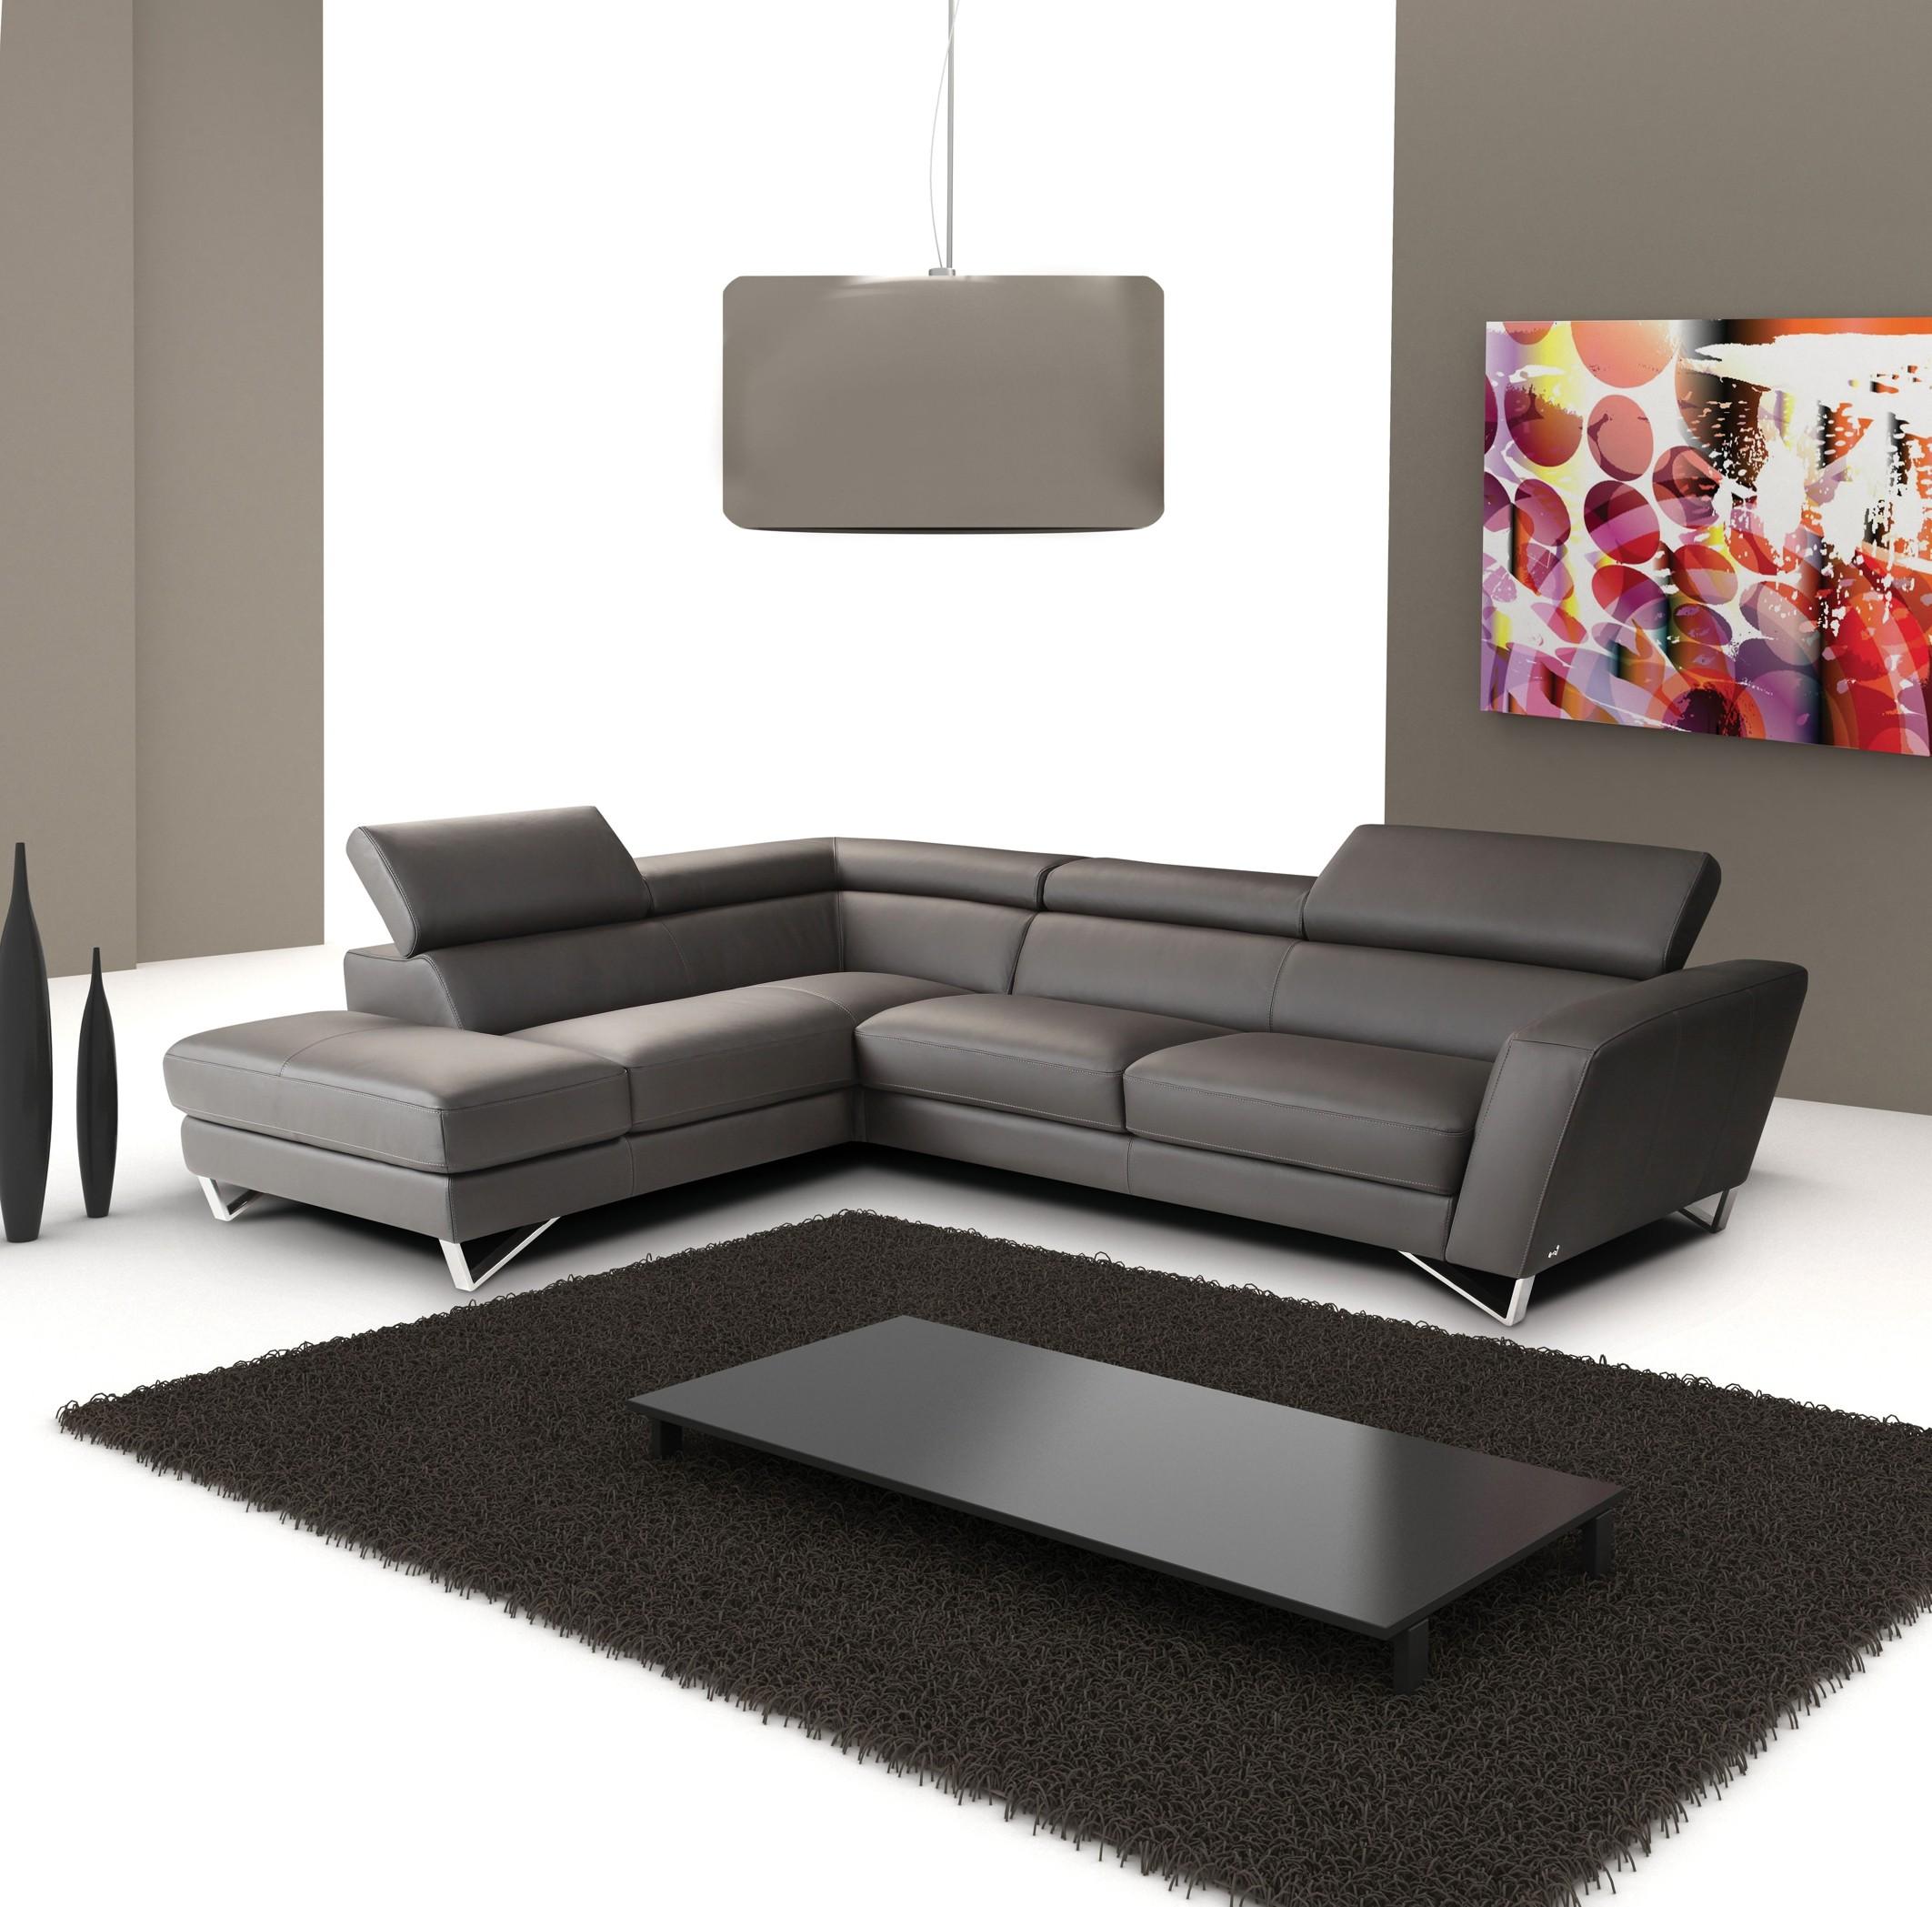 CADO Modern Furniture - SPARTA Italian Leather Modern Sectional Sofa